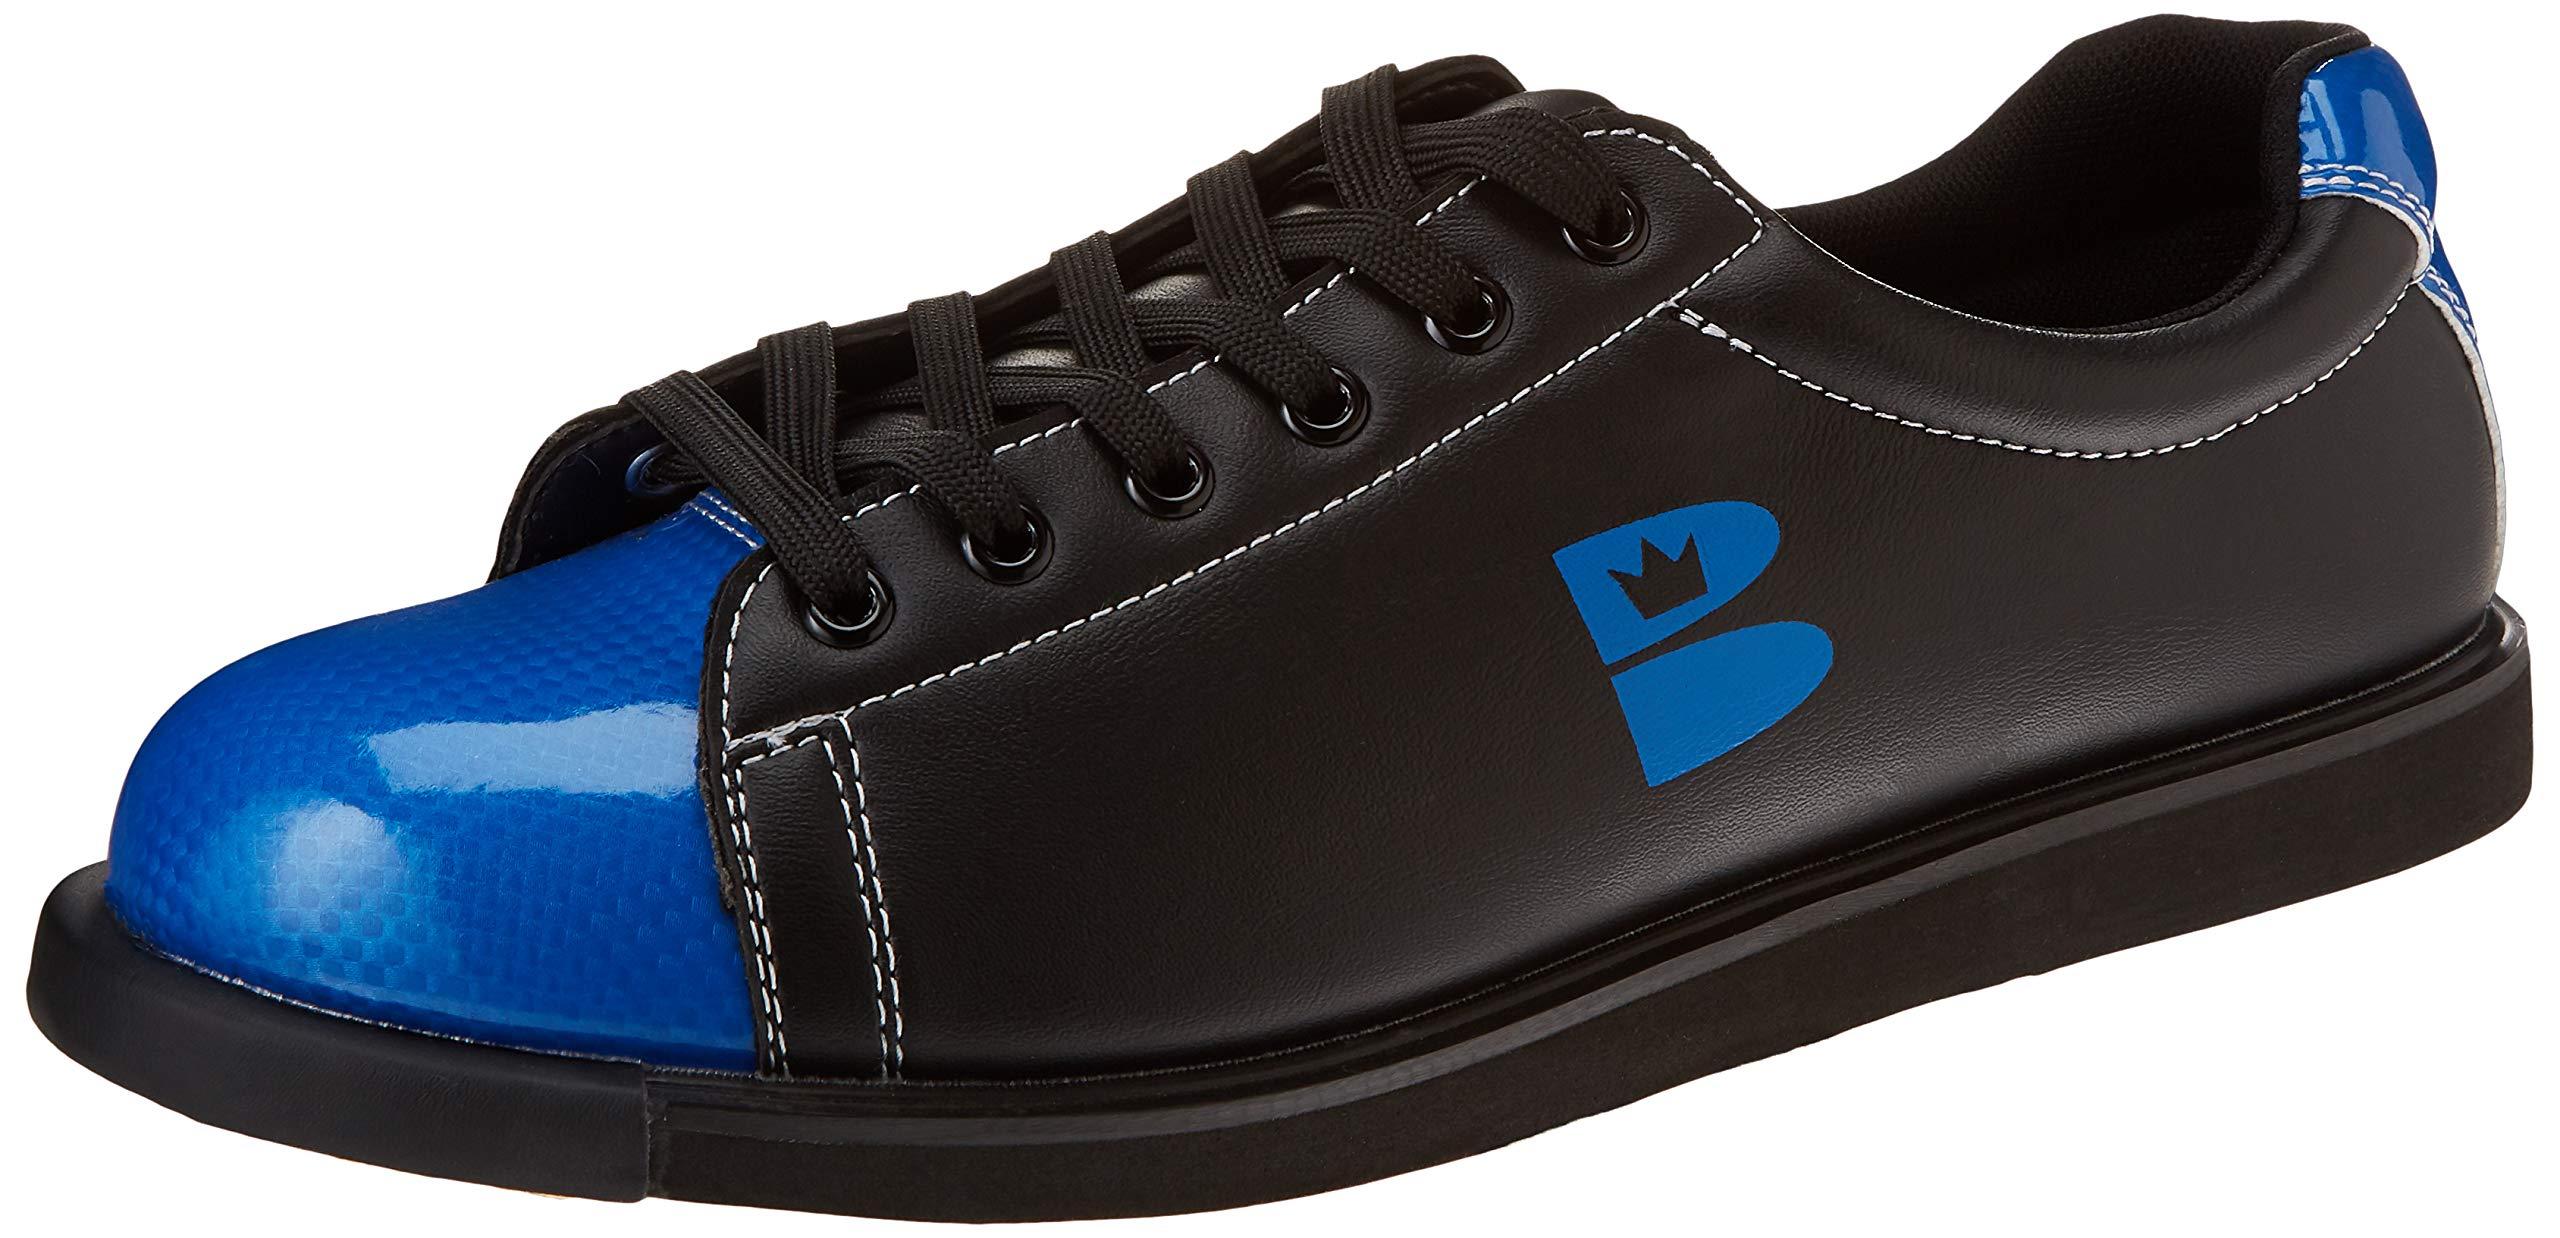 Brunswick TZone Youth Black/Blue Size 4.5/6